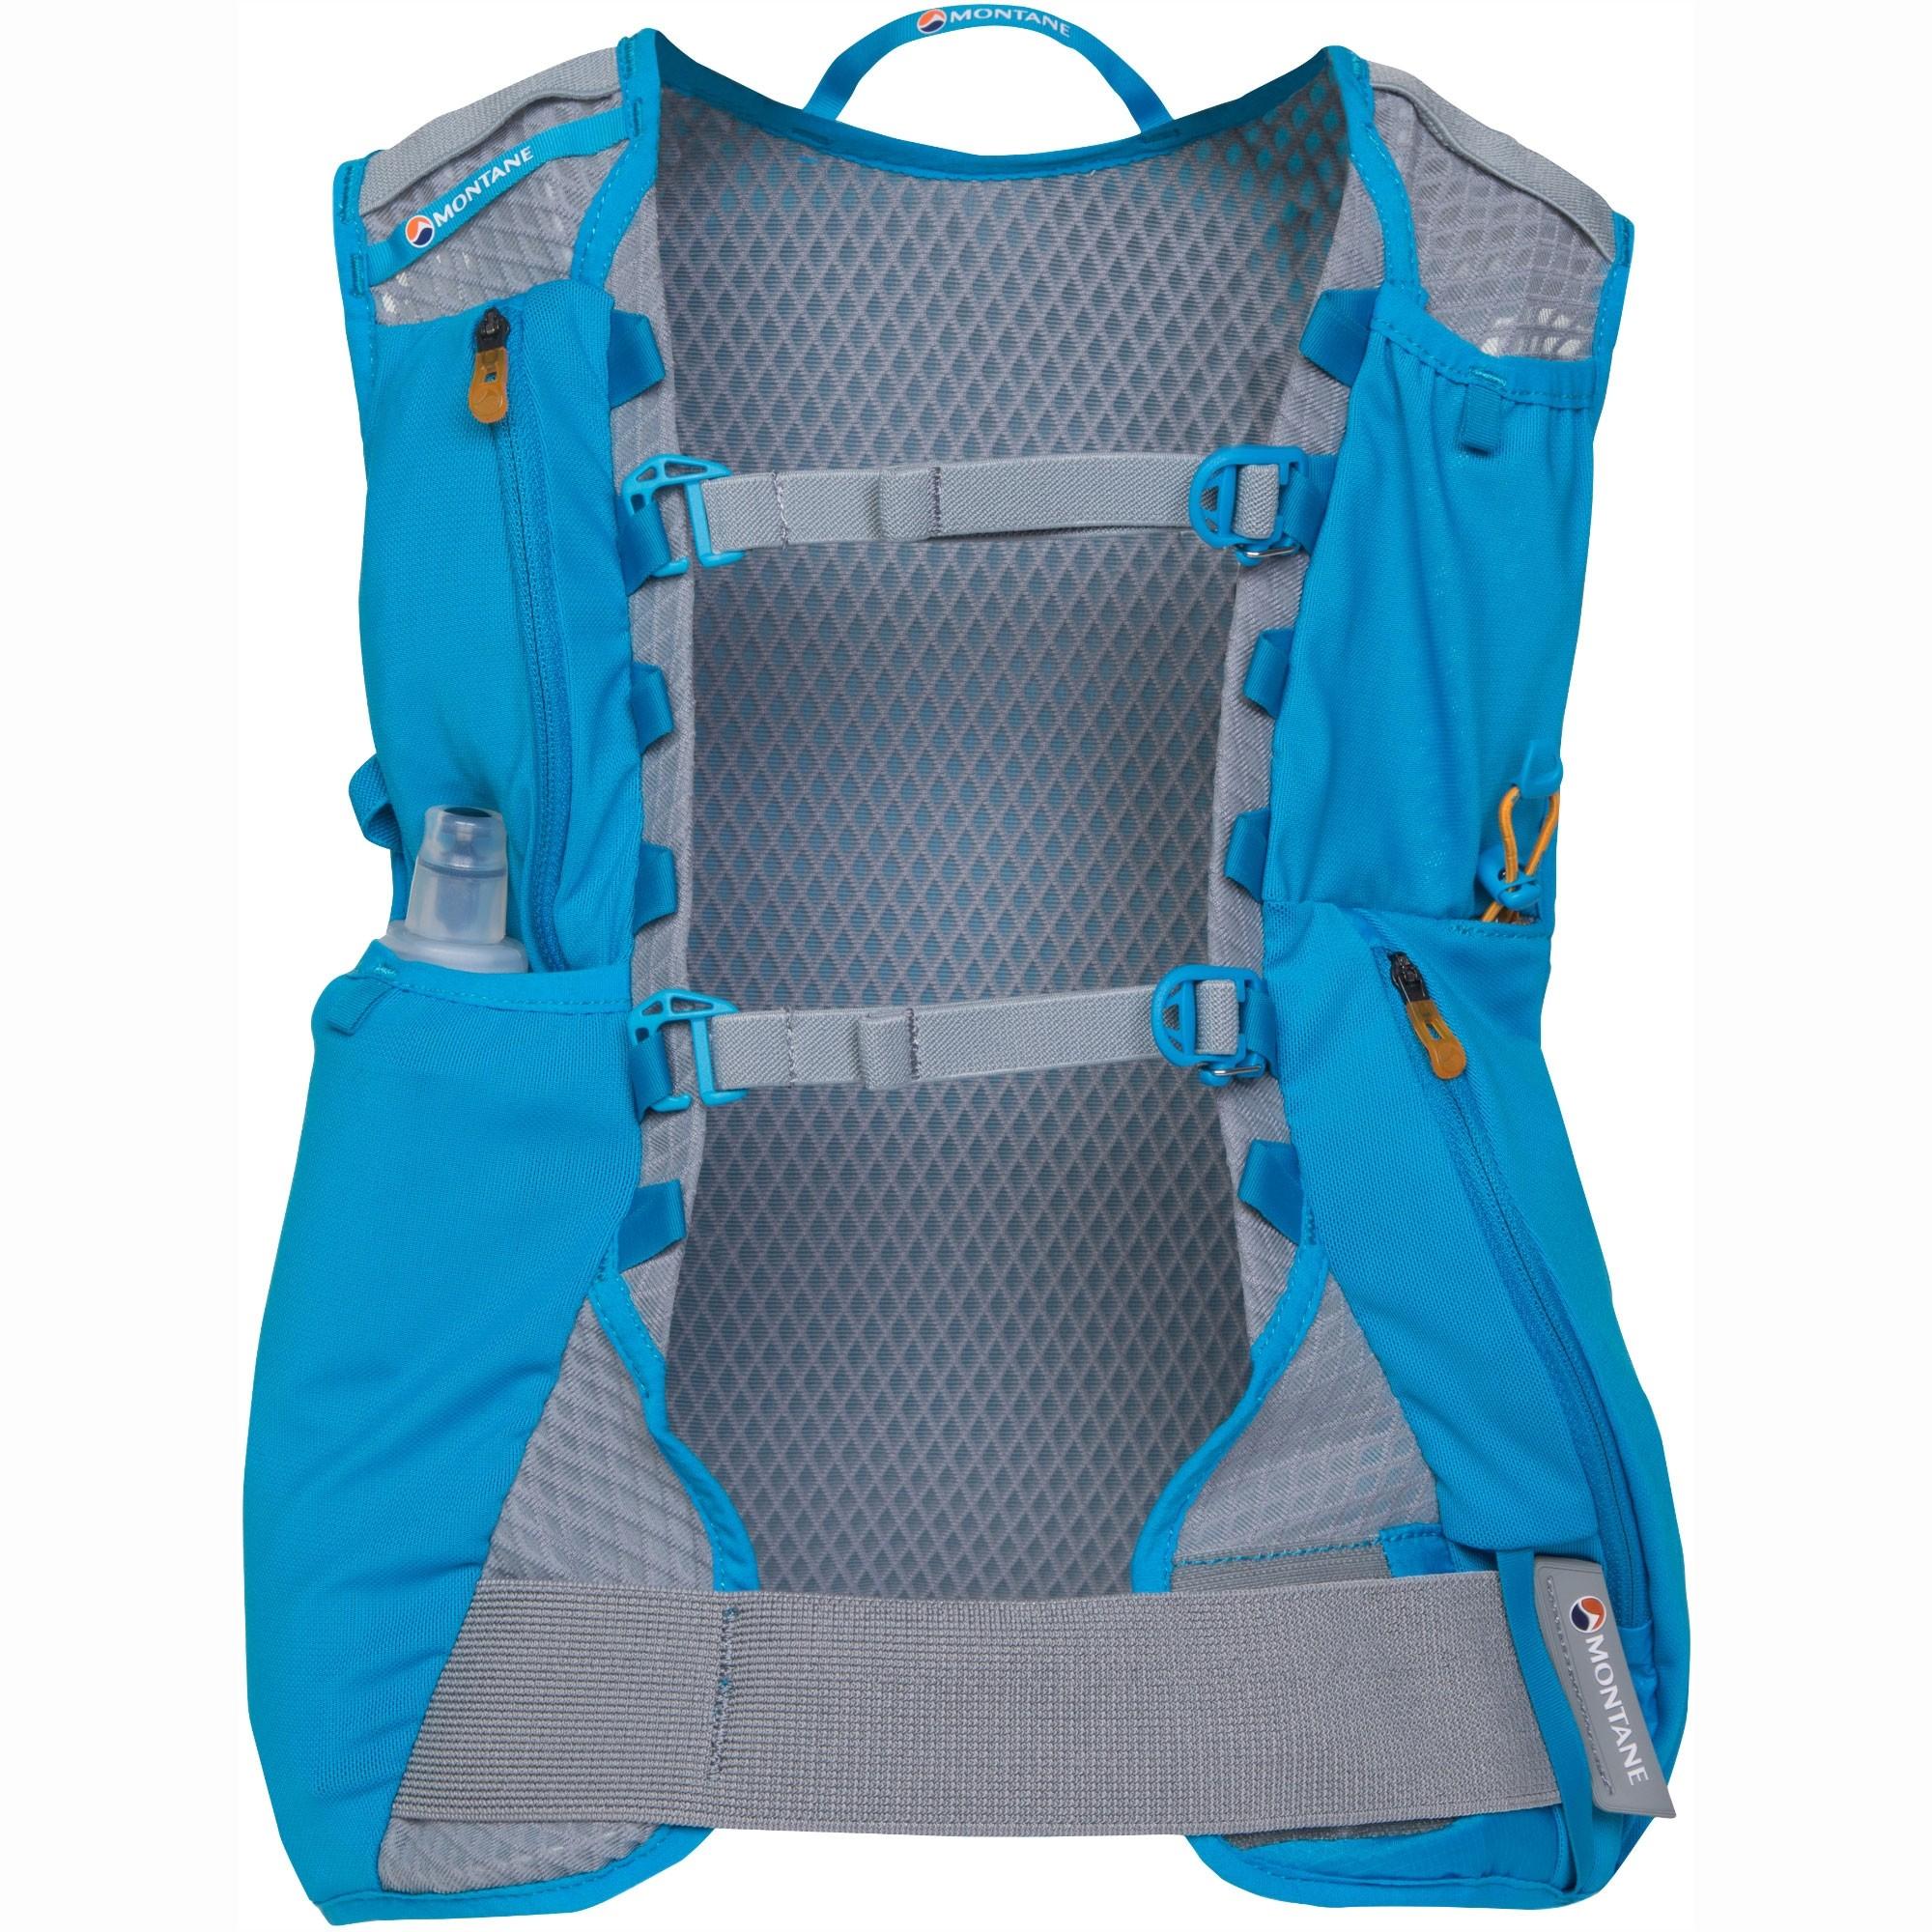 Montane Via Claw4 Women's Trail Running Pack - Cerulean Blue/Cloudburst Grey/Tabluar Orange